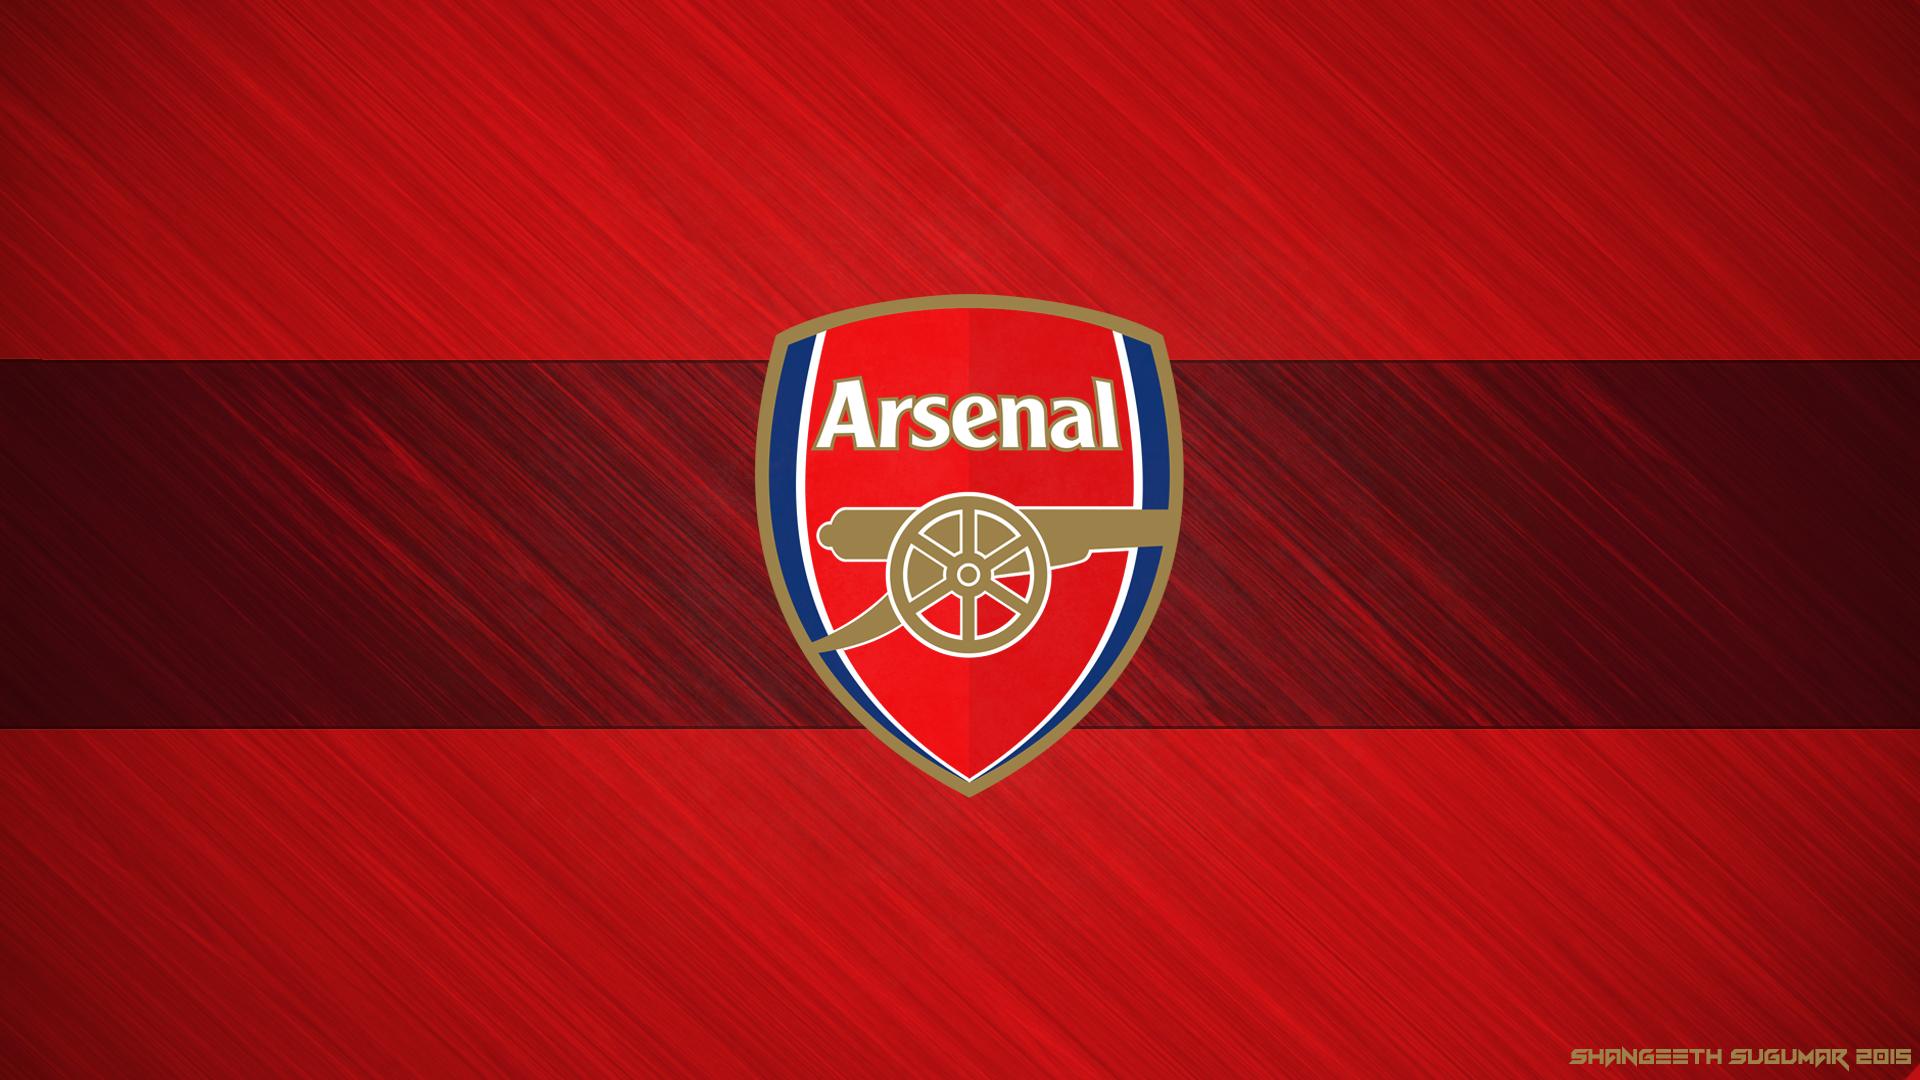 Arsenal FC 2015 Wallpaper   By Shangeeth Sugumar by ShangeethS on 1920x1080